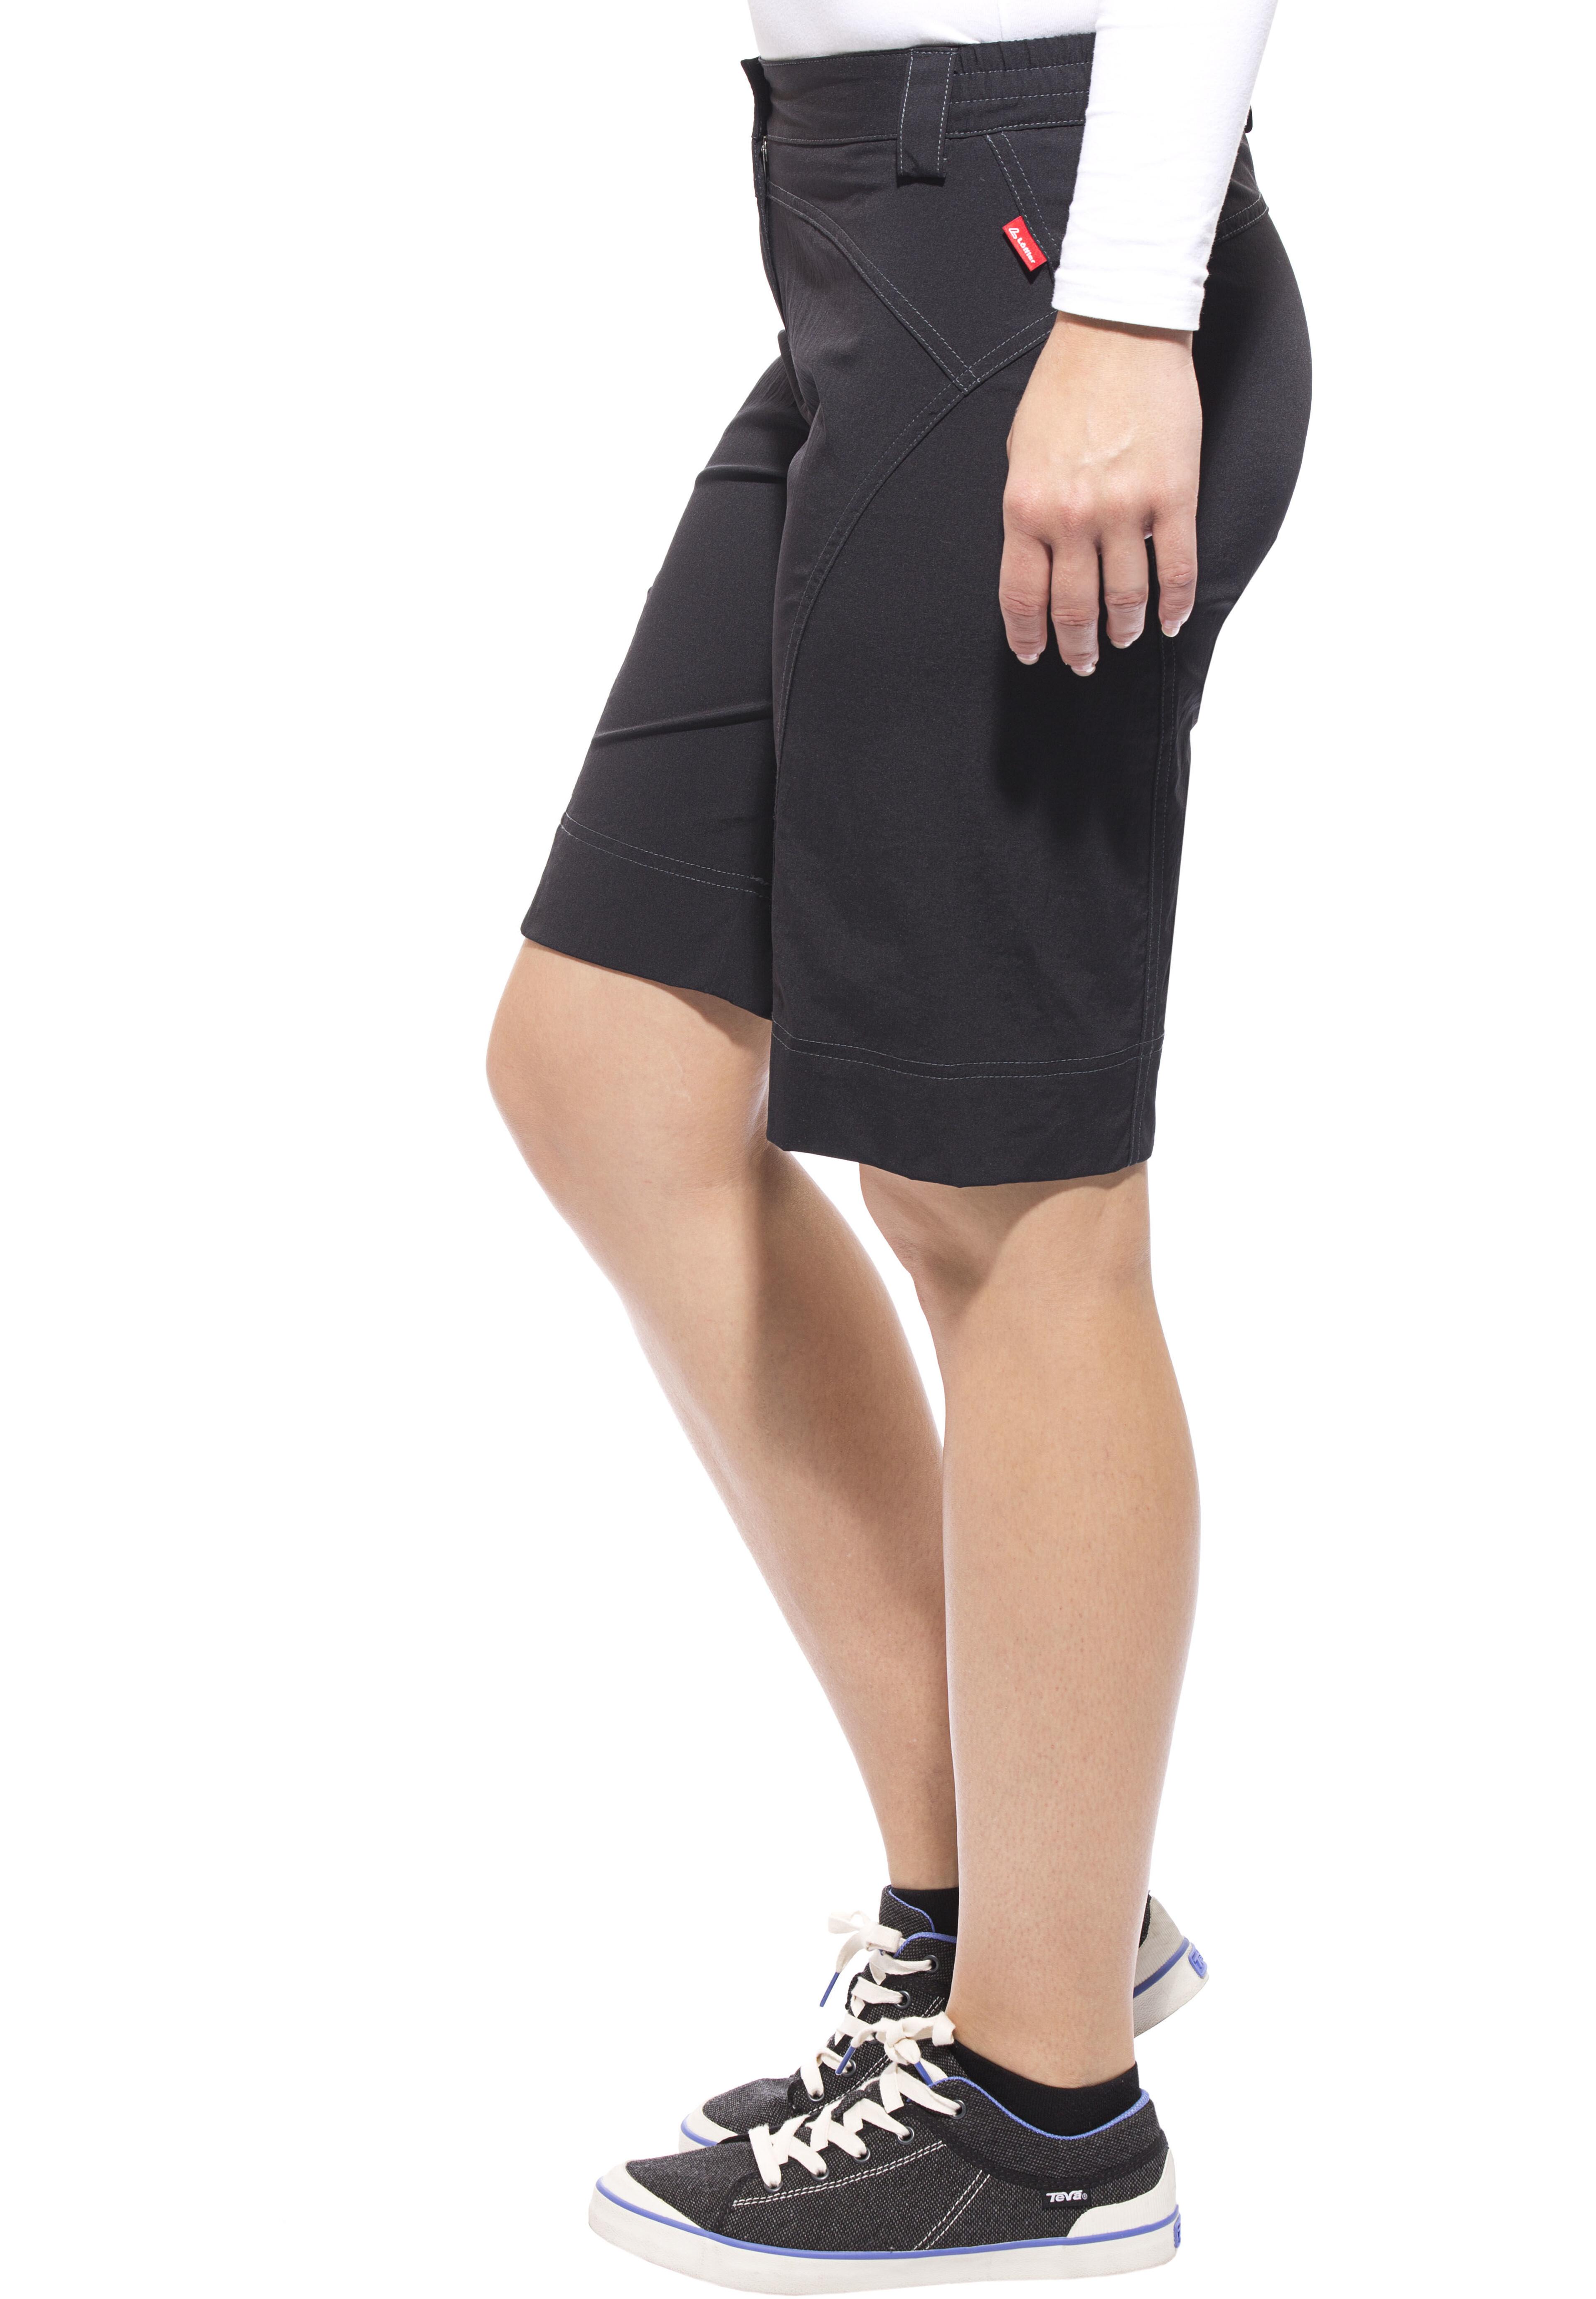 Löffler Comfort CSL Bike Shorts Damen online kaufen   fahrrad.de 8ee894ecef